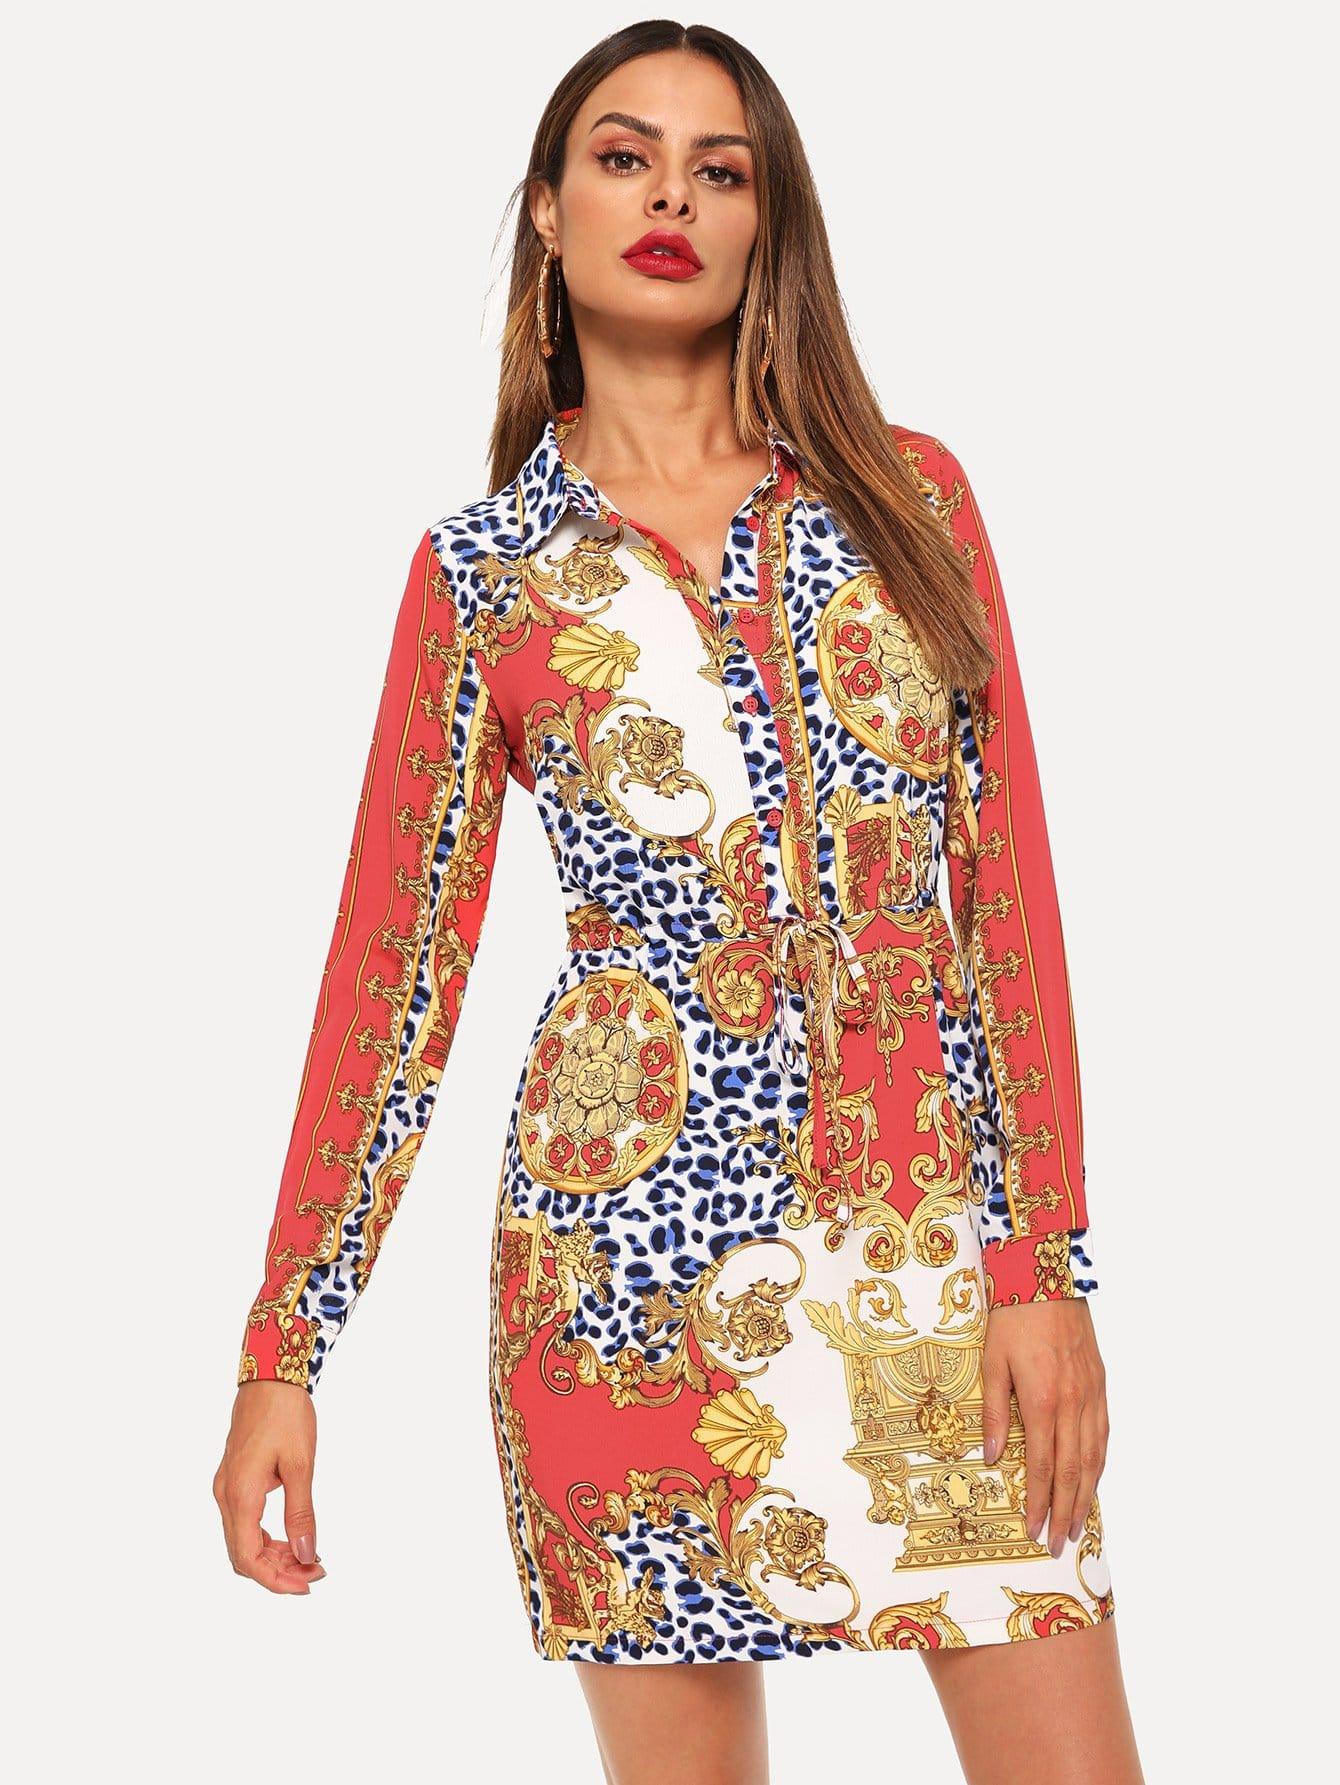 6acd3b7a43 Baroque Print Shirt Dress EmmaCloth-Women Fast Fashion Online